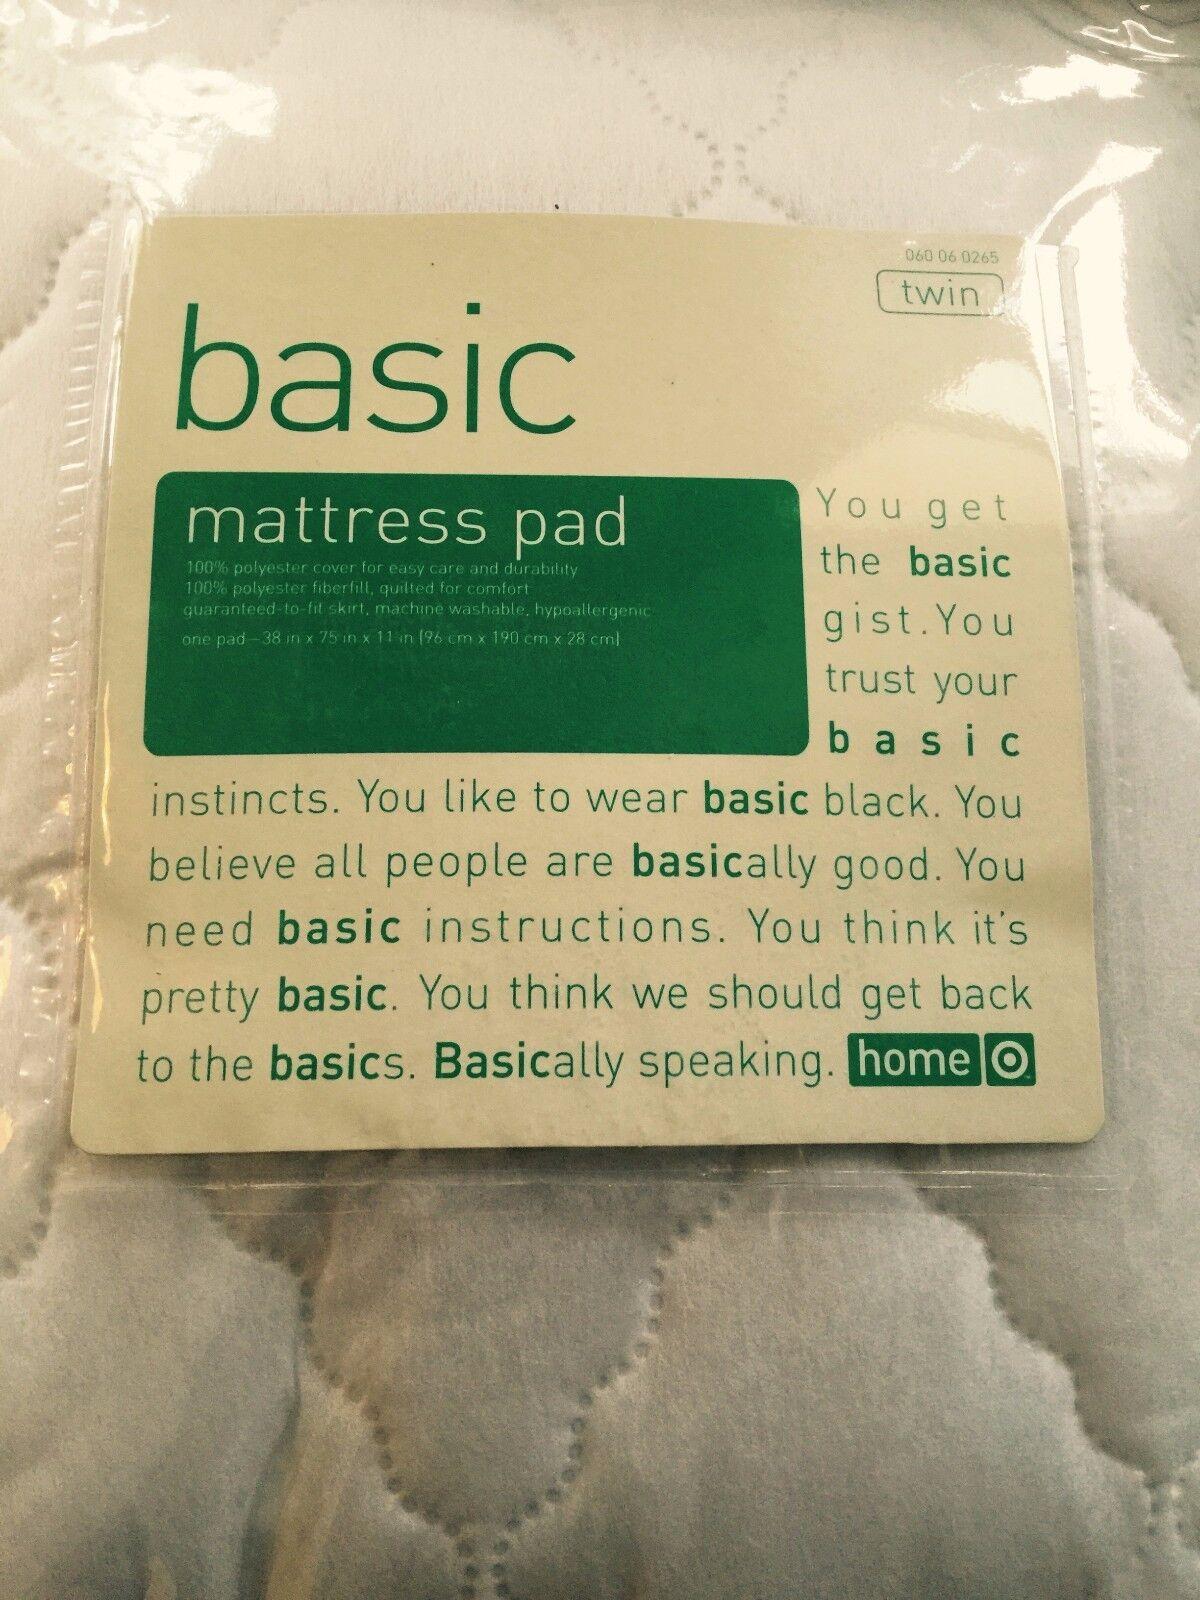 basic twin mattress pad 38 x 75